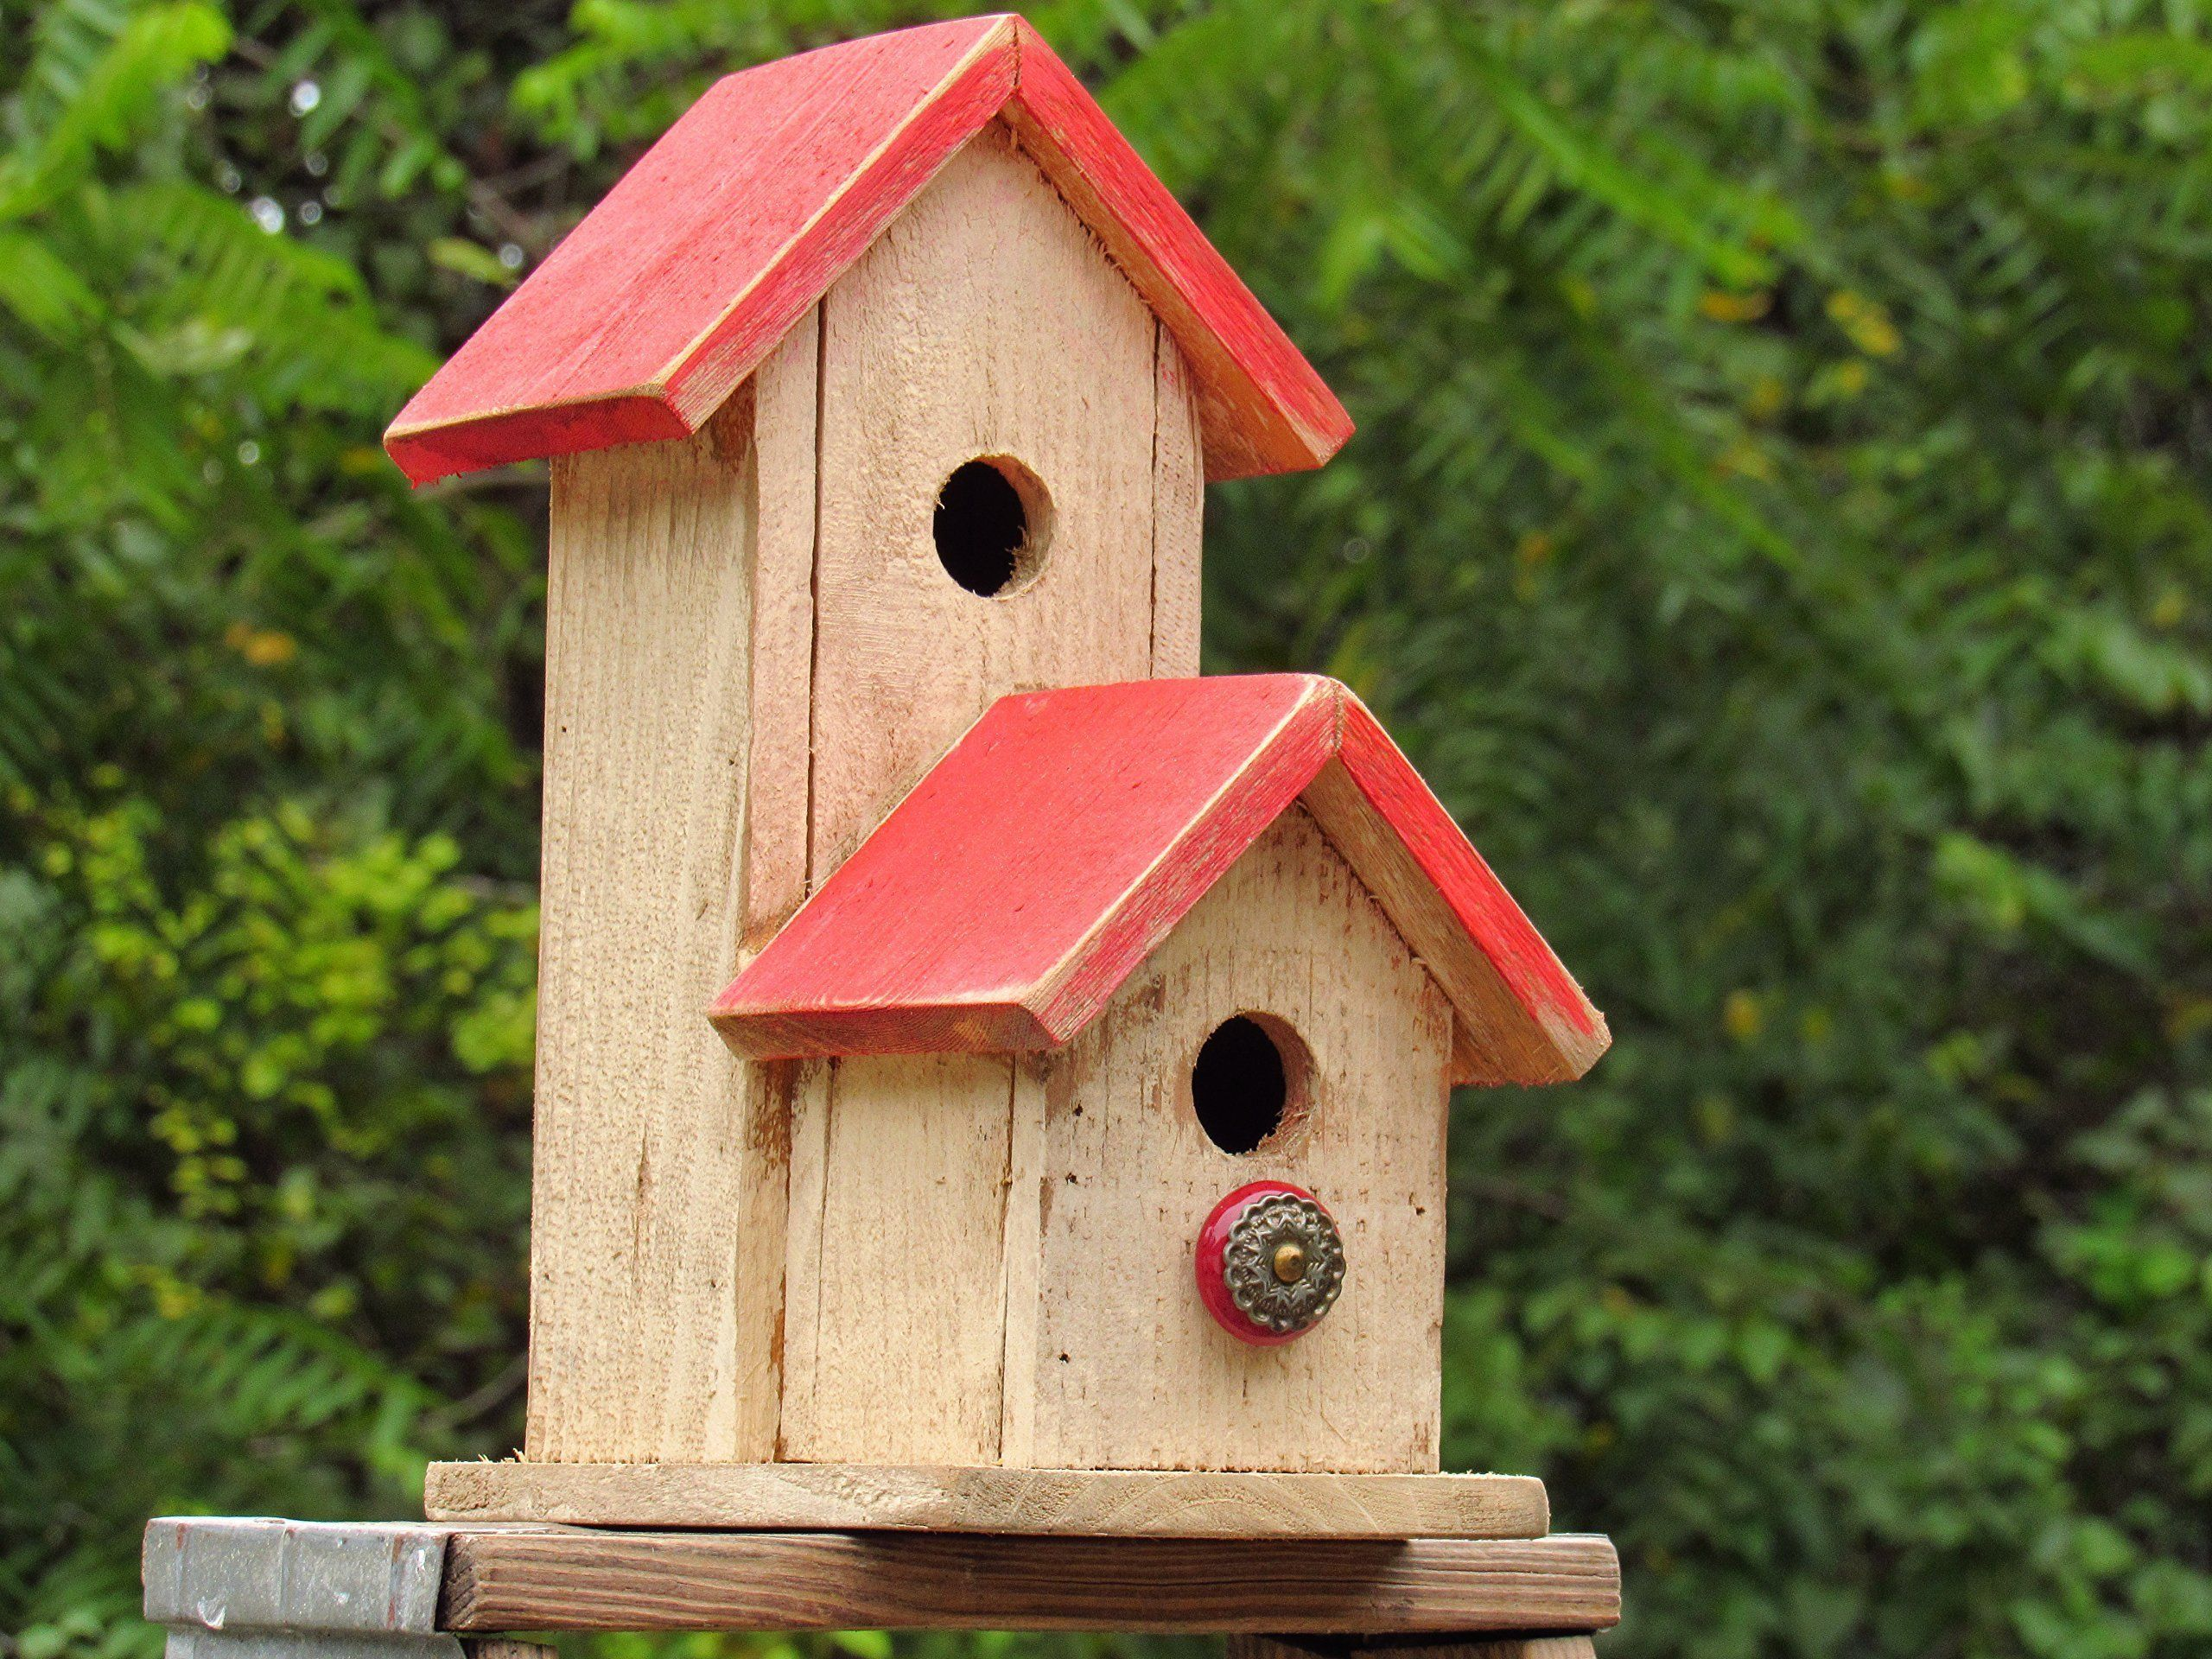 Red and white Purple Martin bird house